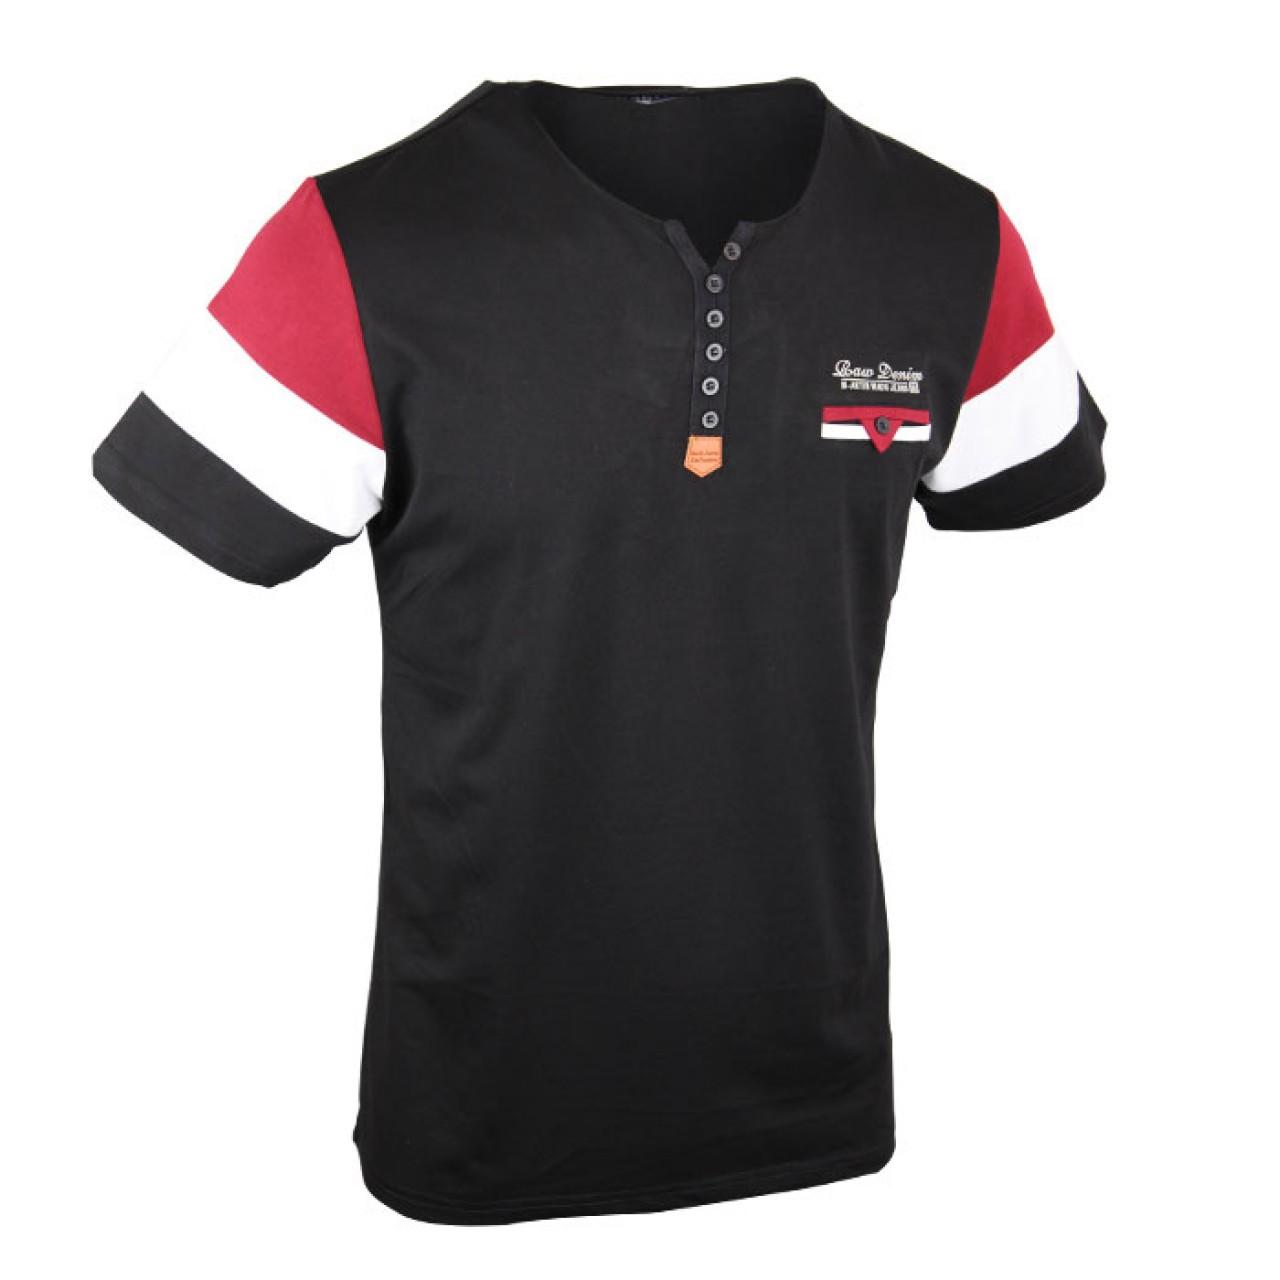 Men's Stylish Black Red Color Crew Neck Tee